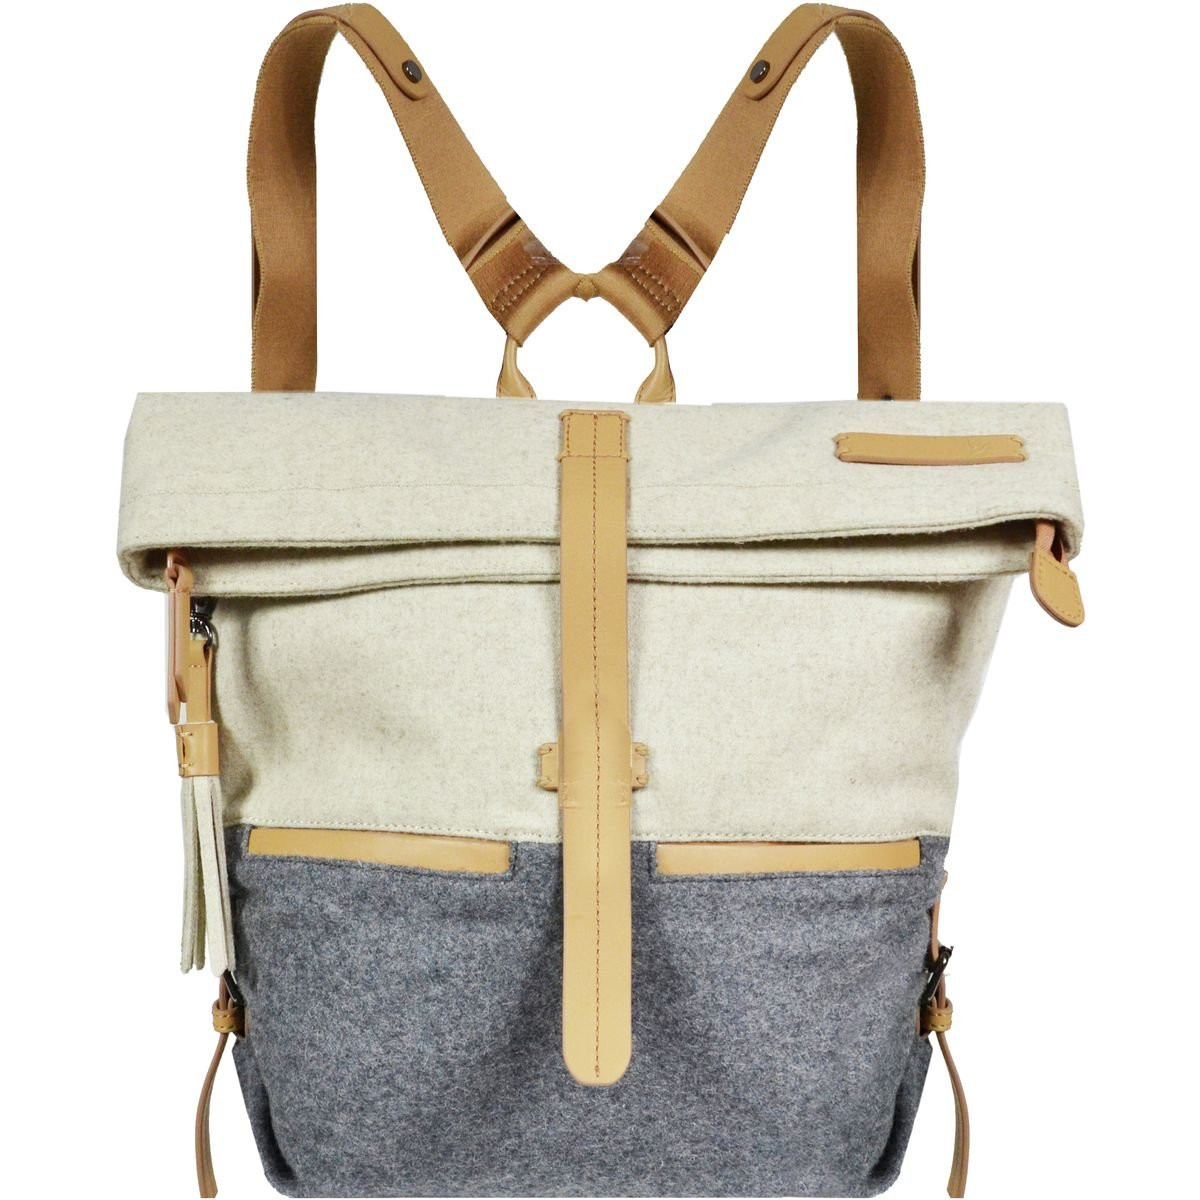 Sherpani Amelia Travel Backpack, One Size, Buff/Chai